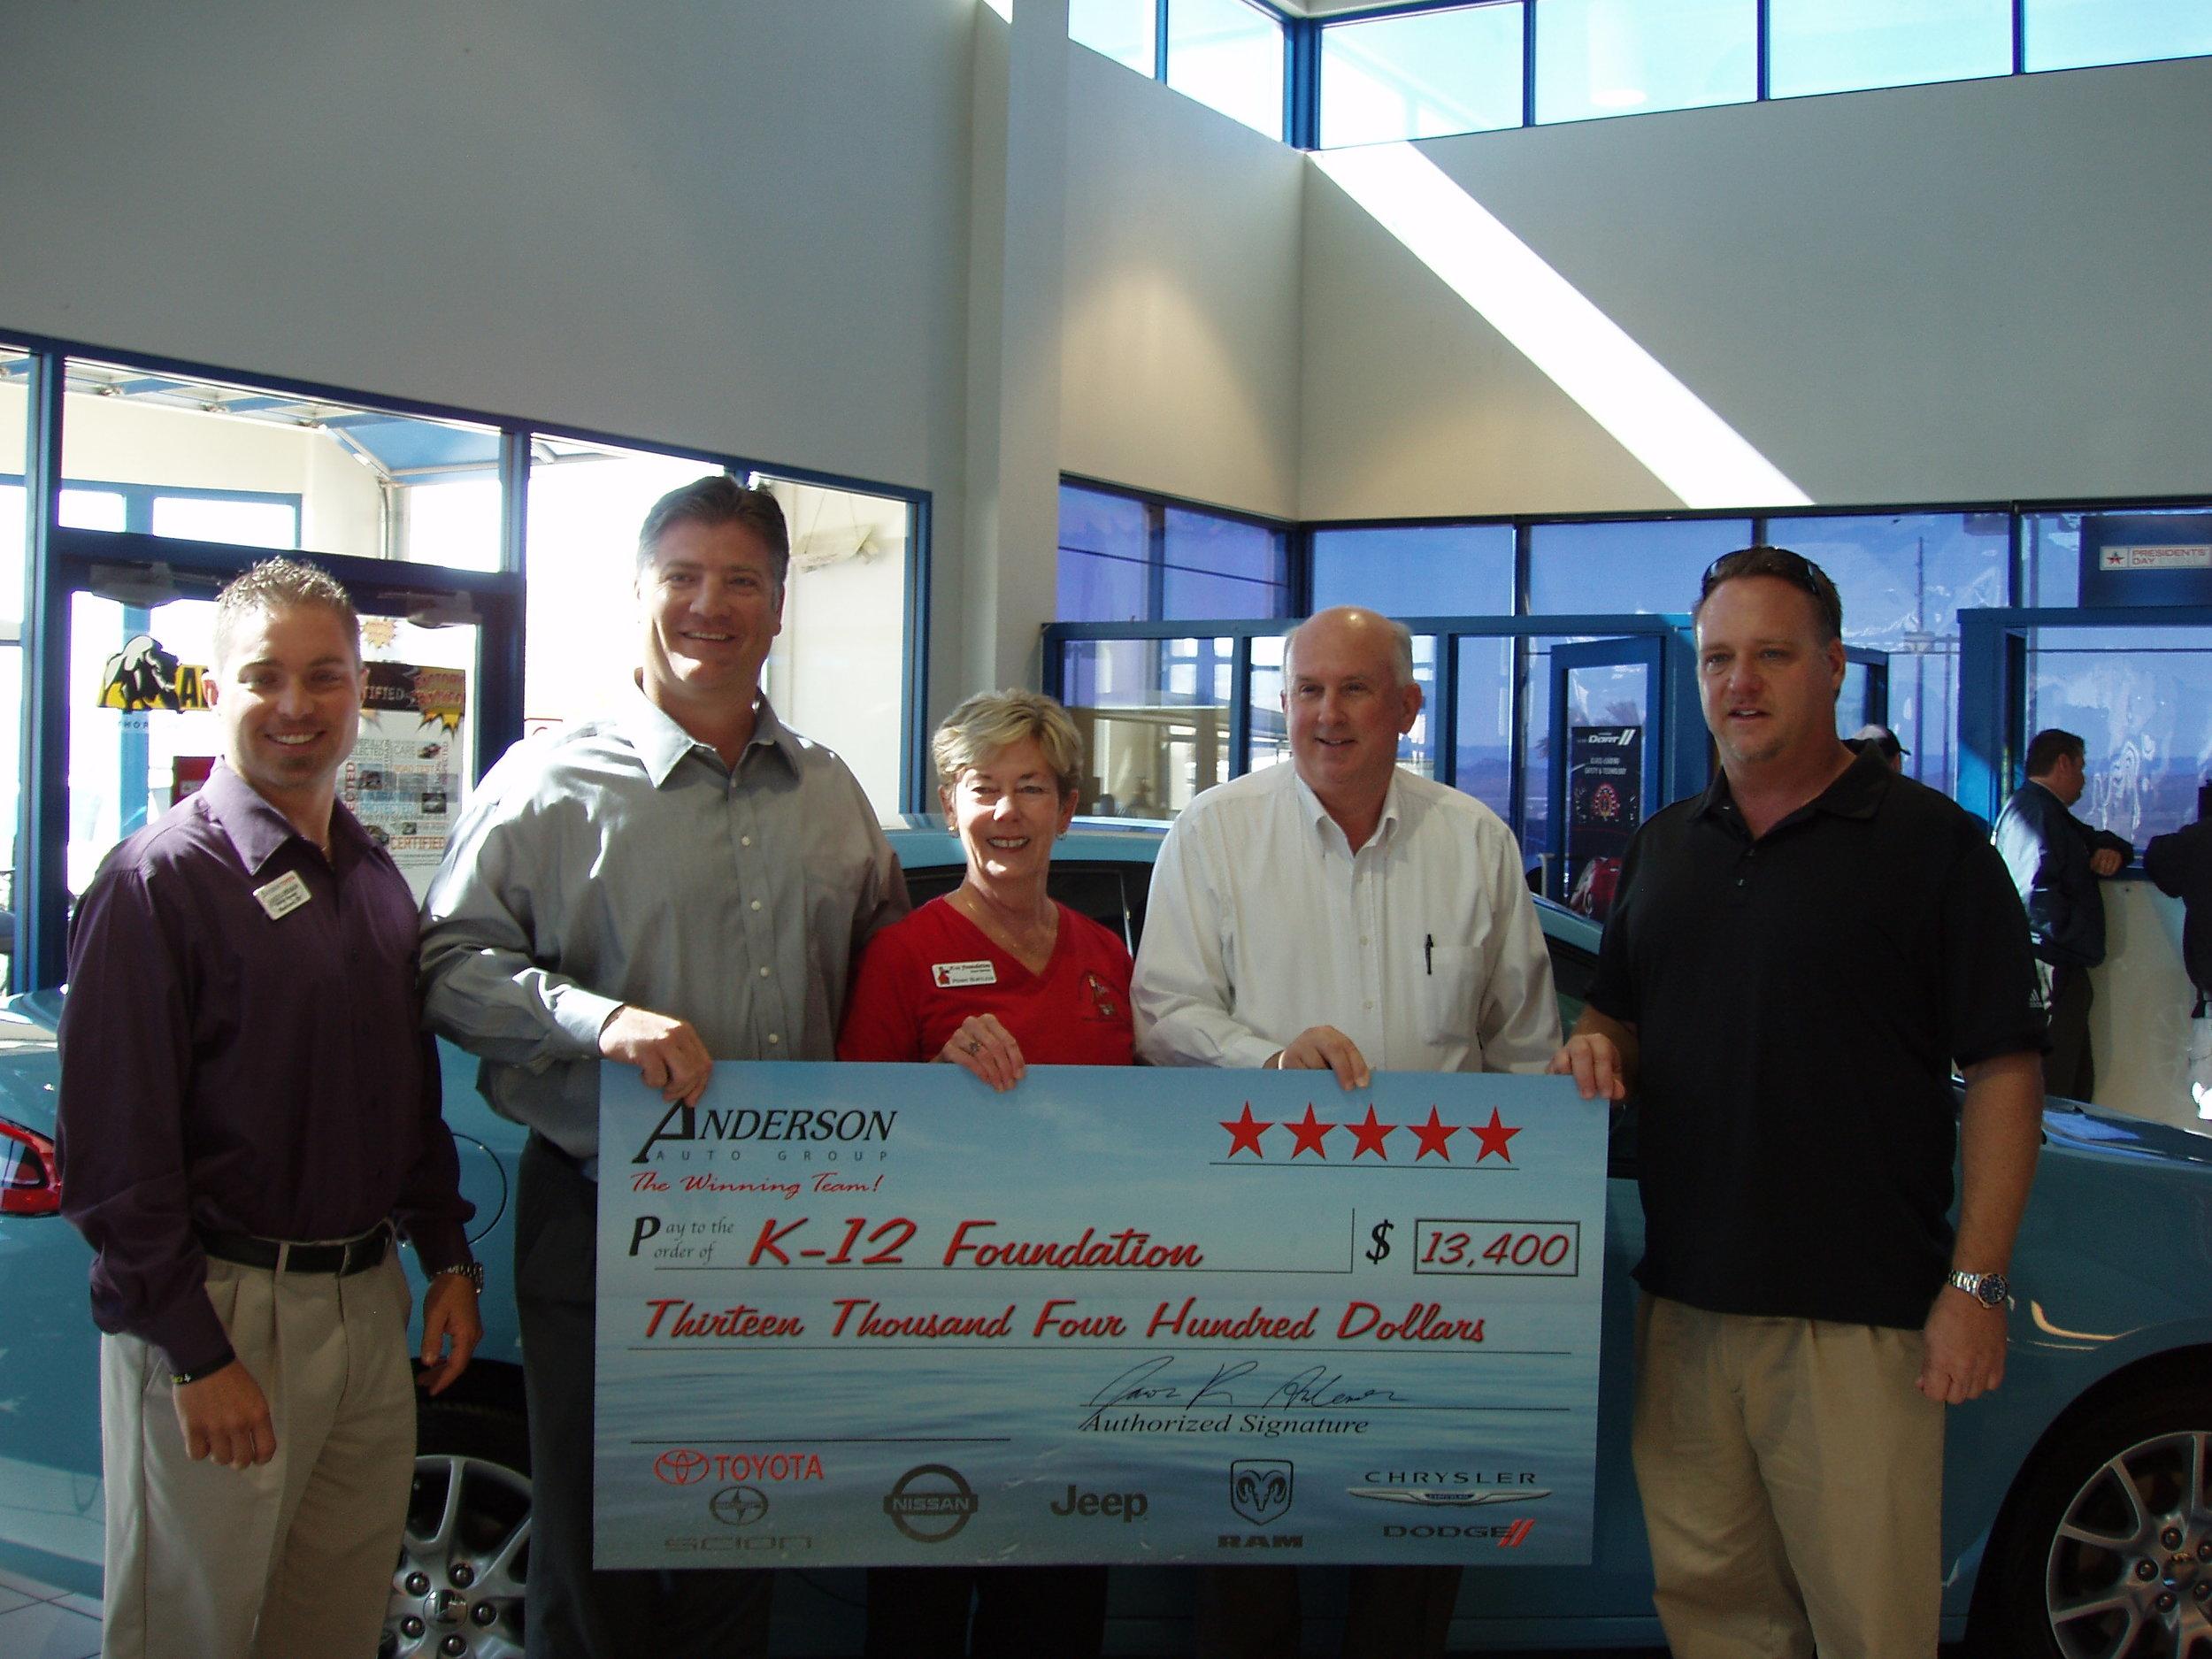 Anderson Auto Dealerships K12 Donation Feb 2013